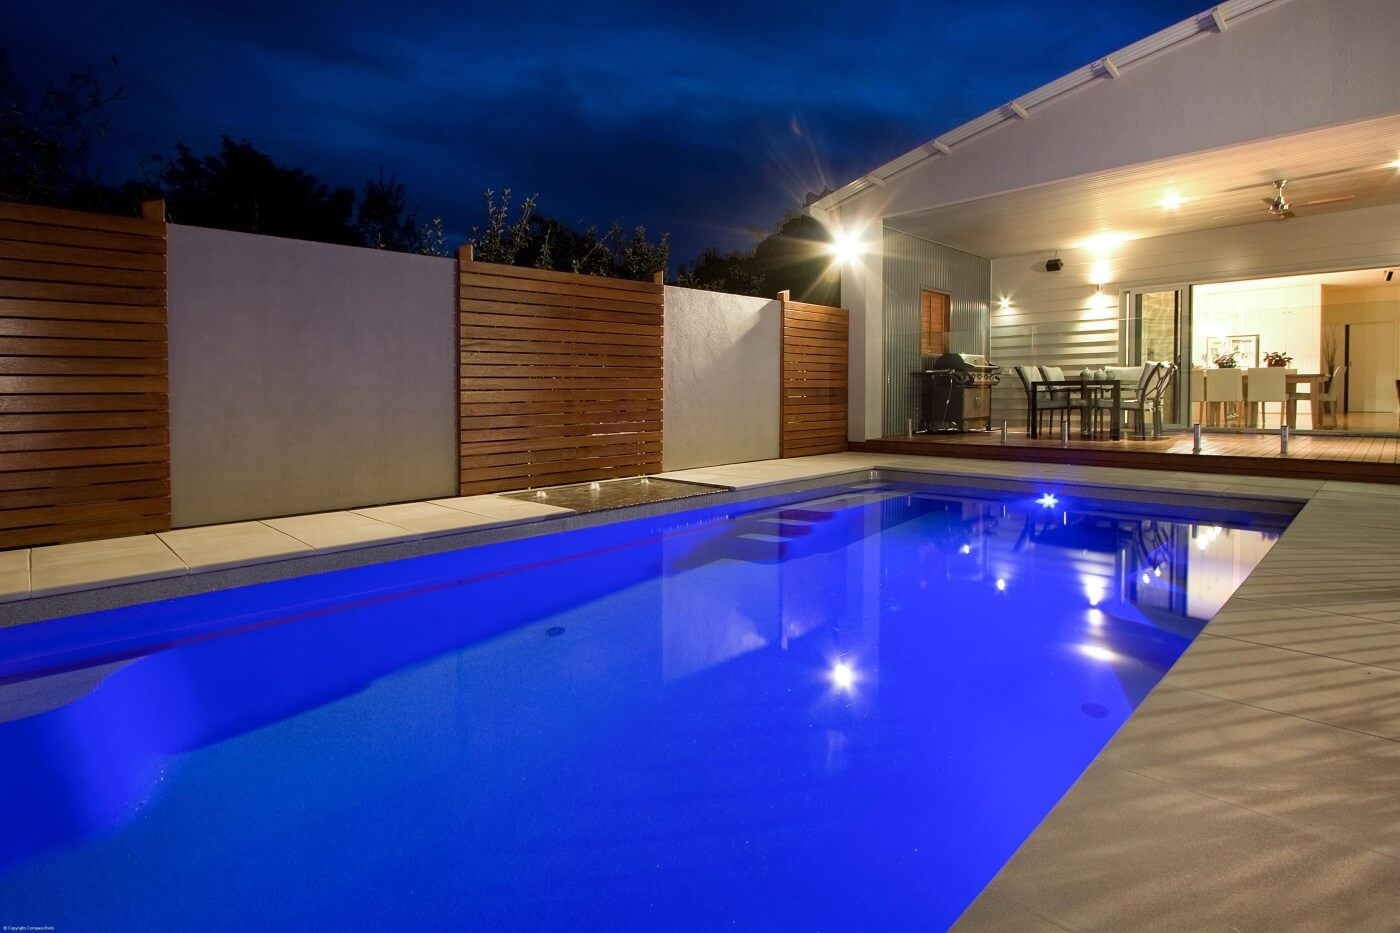 Light Up Your Pool With Pool Lighting Compass Pool